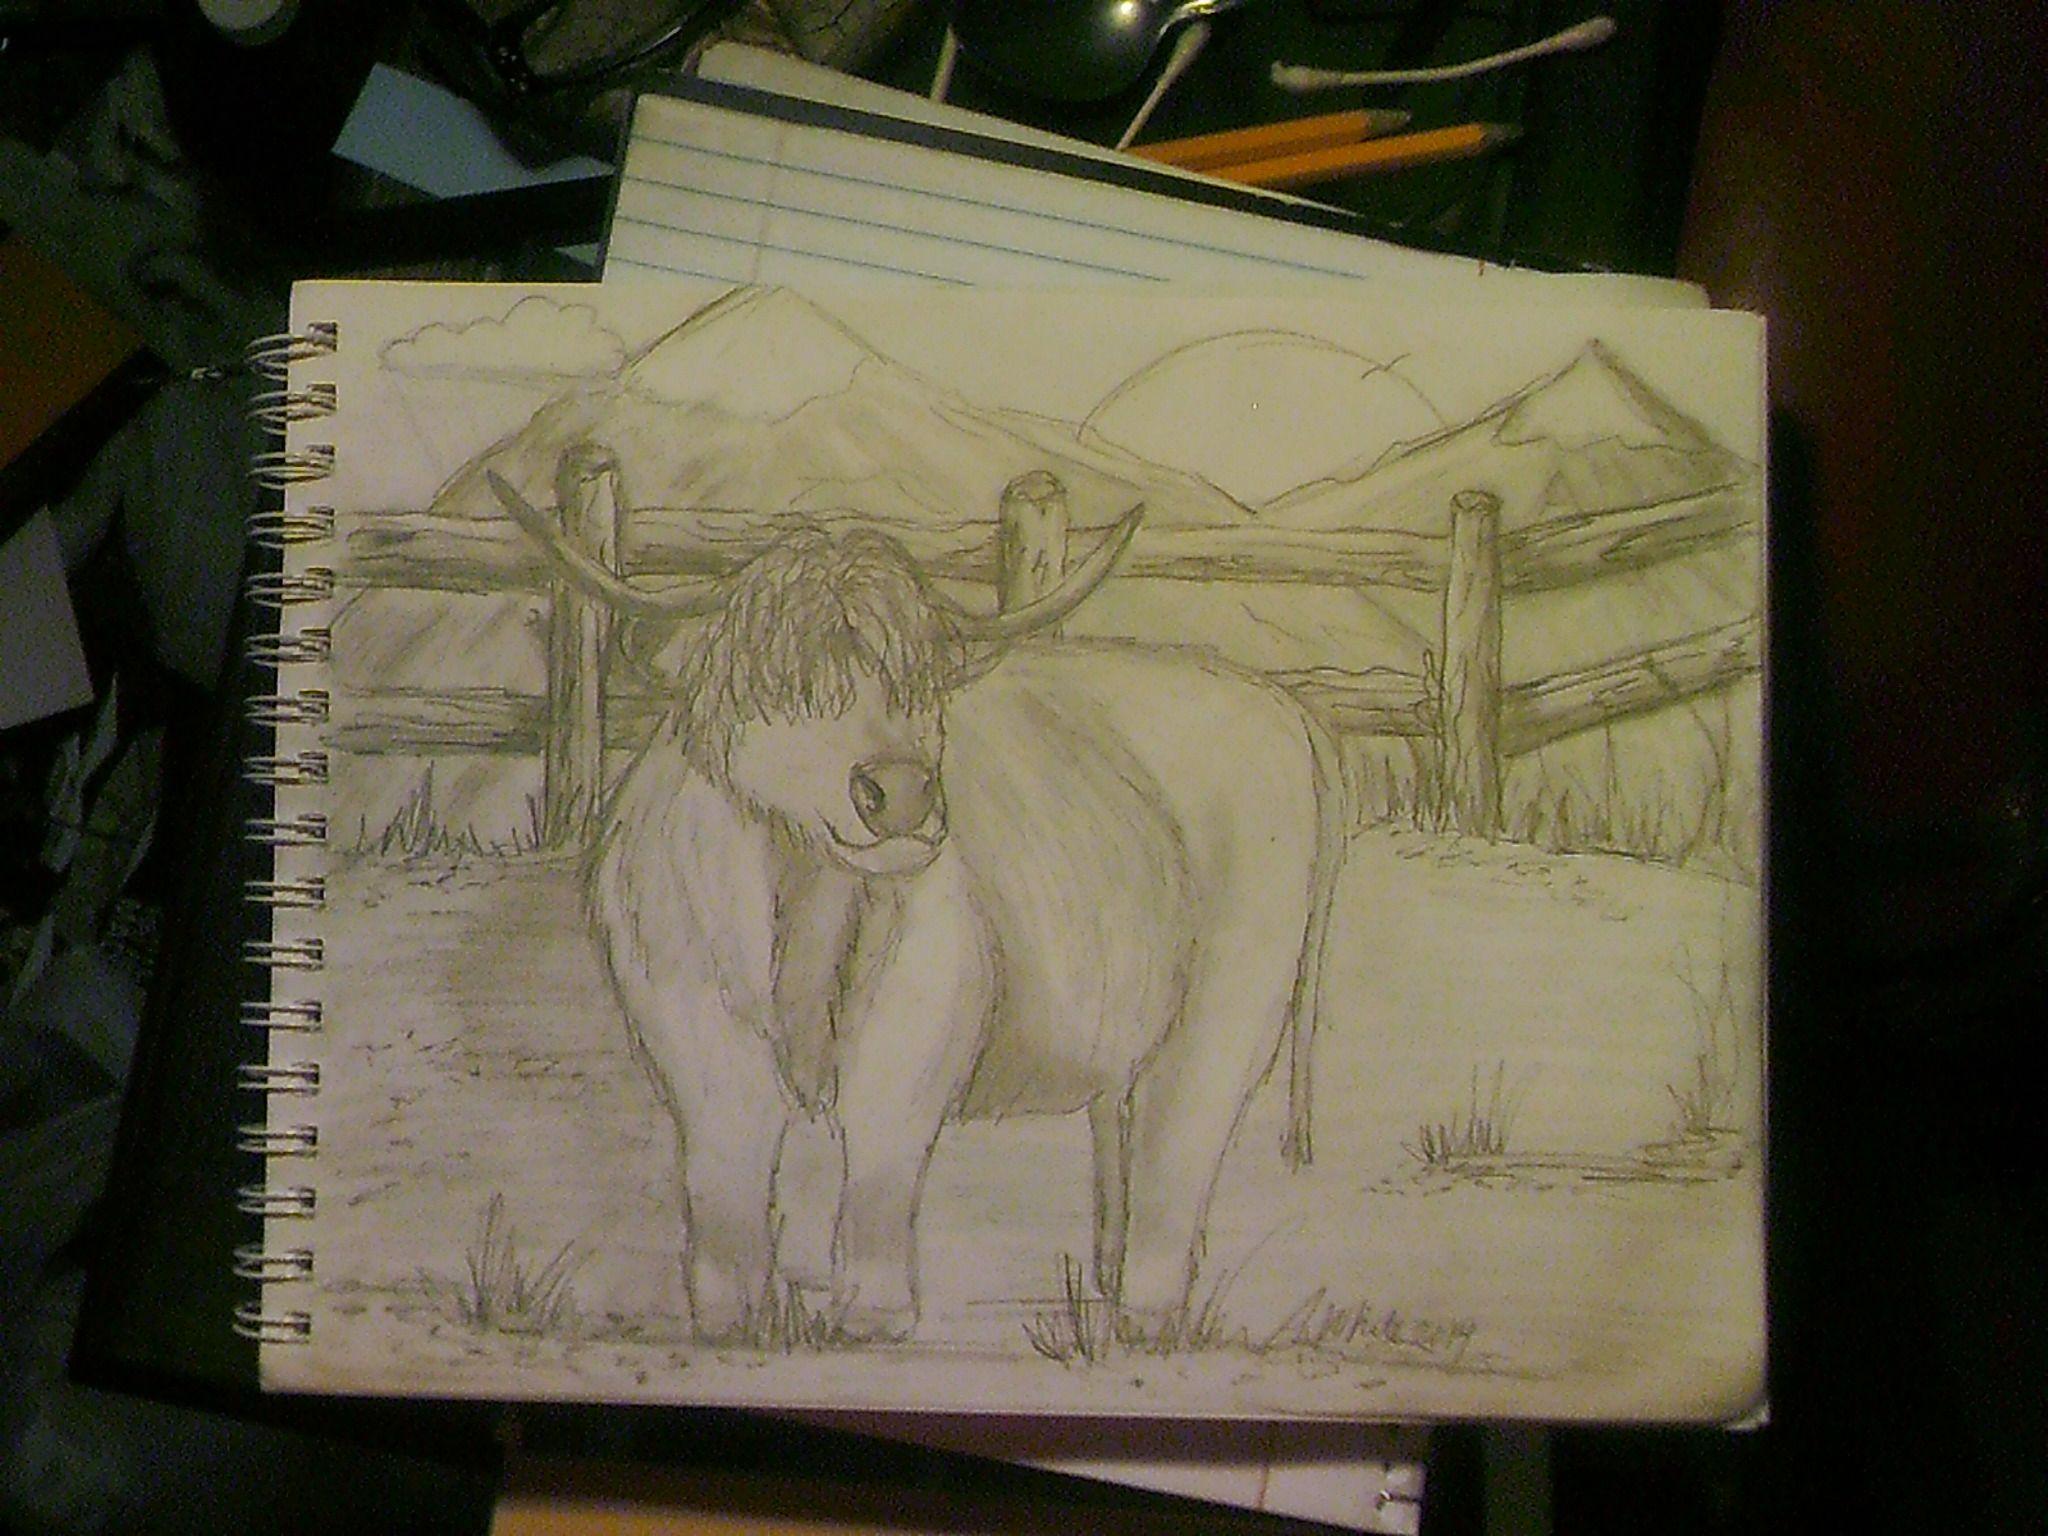 Cow, pencil illustration.